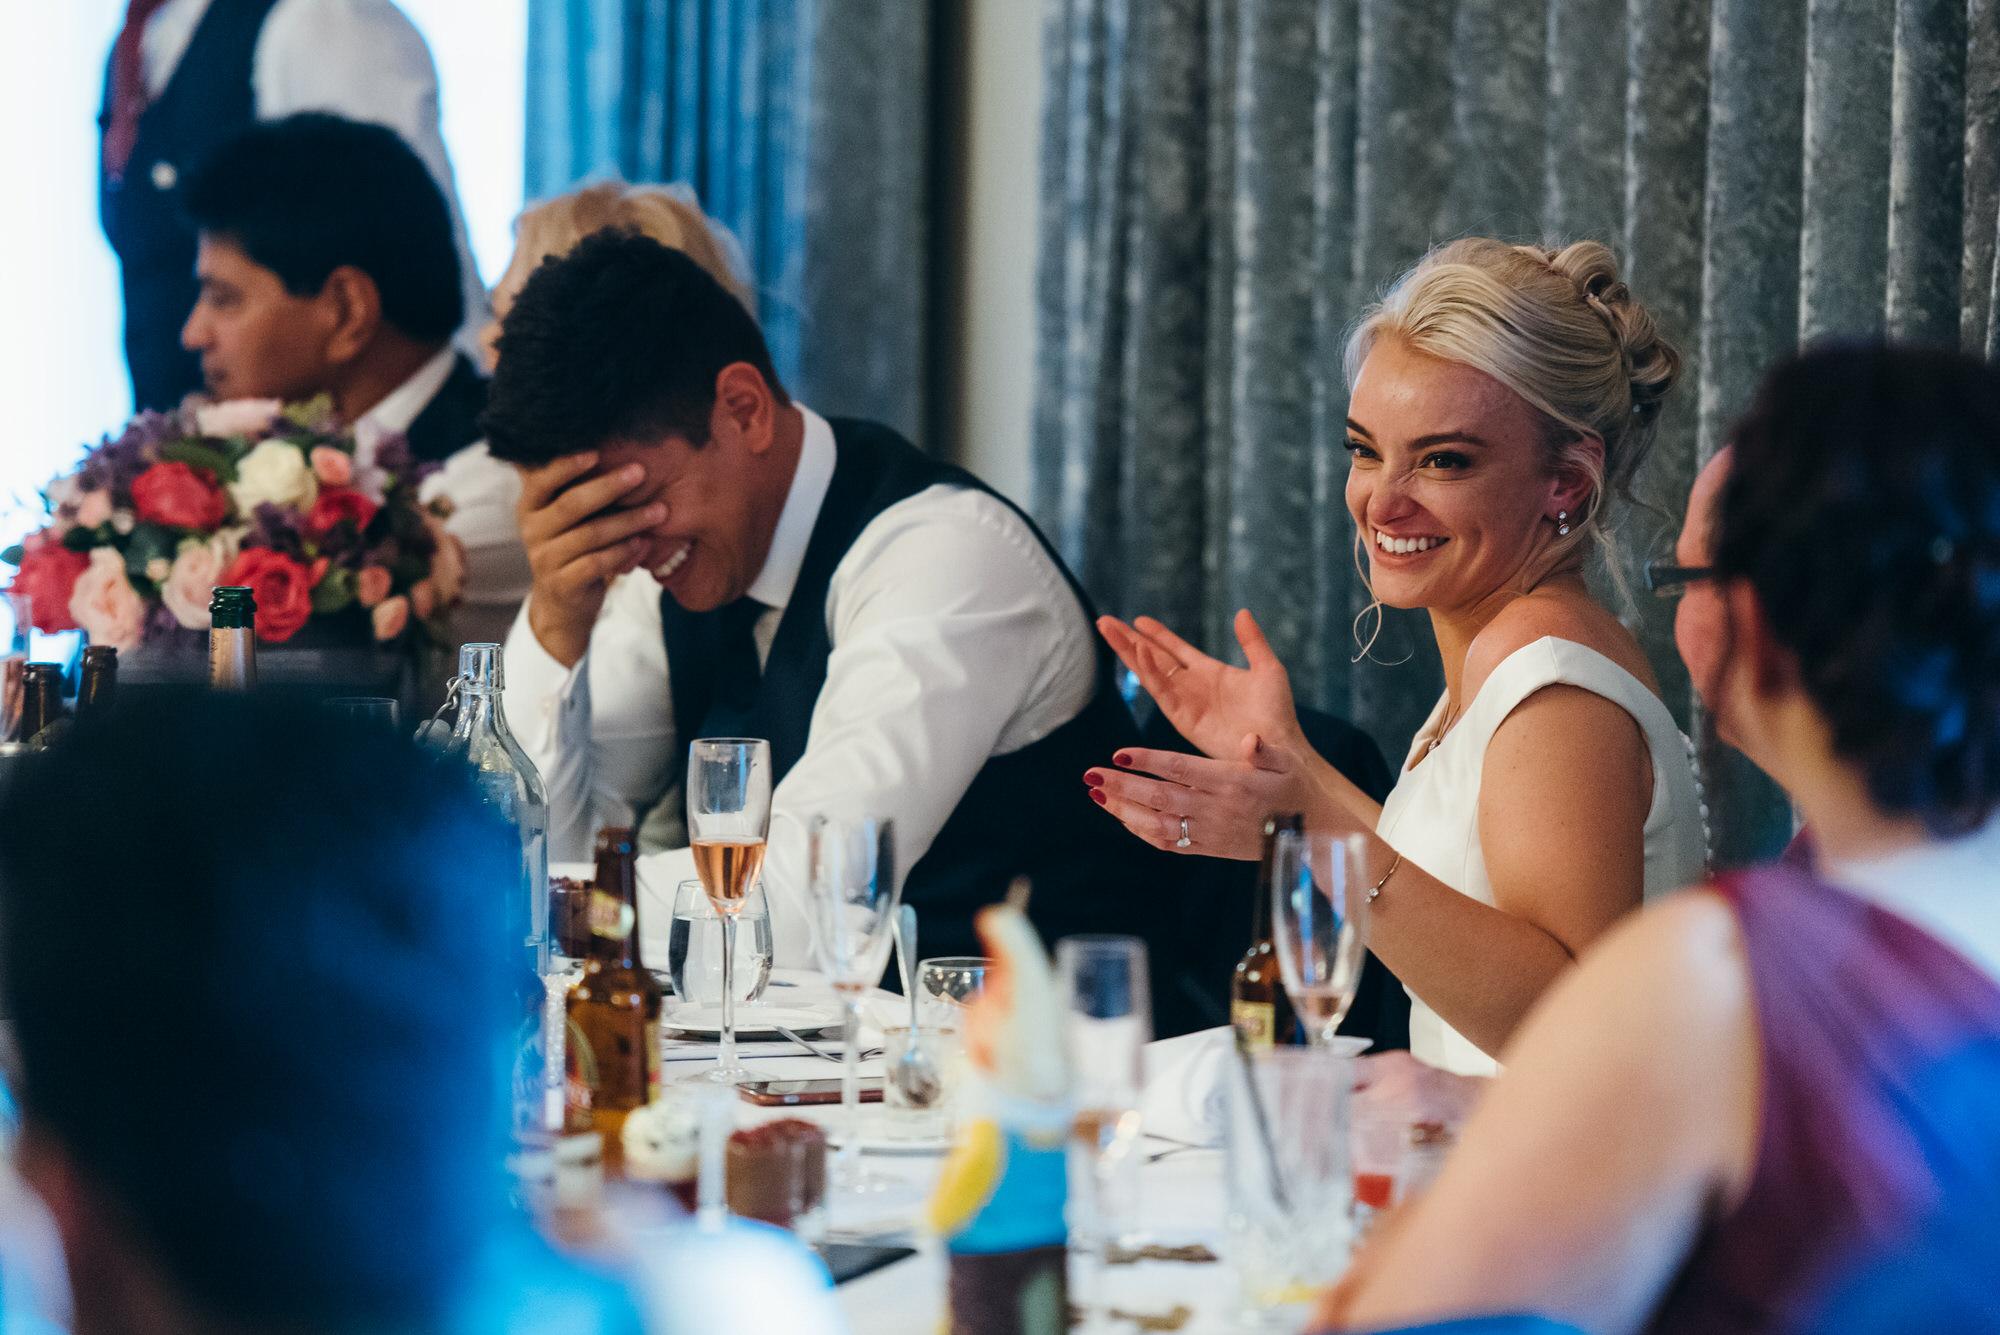 Merrydale manor wedding photography 094